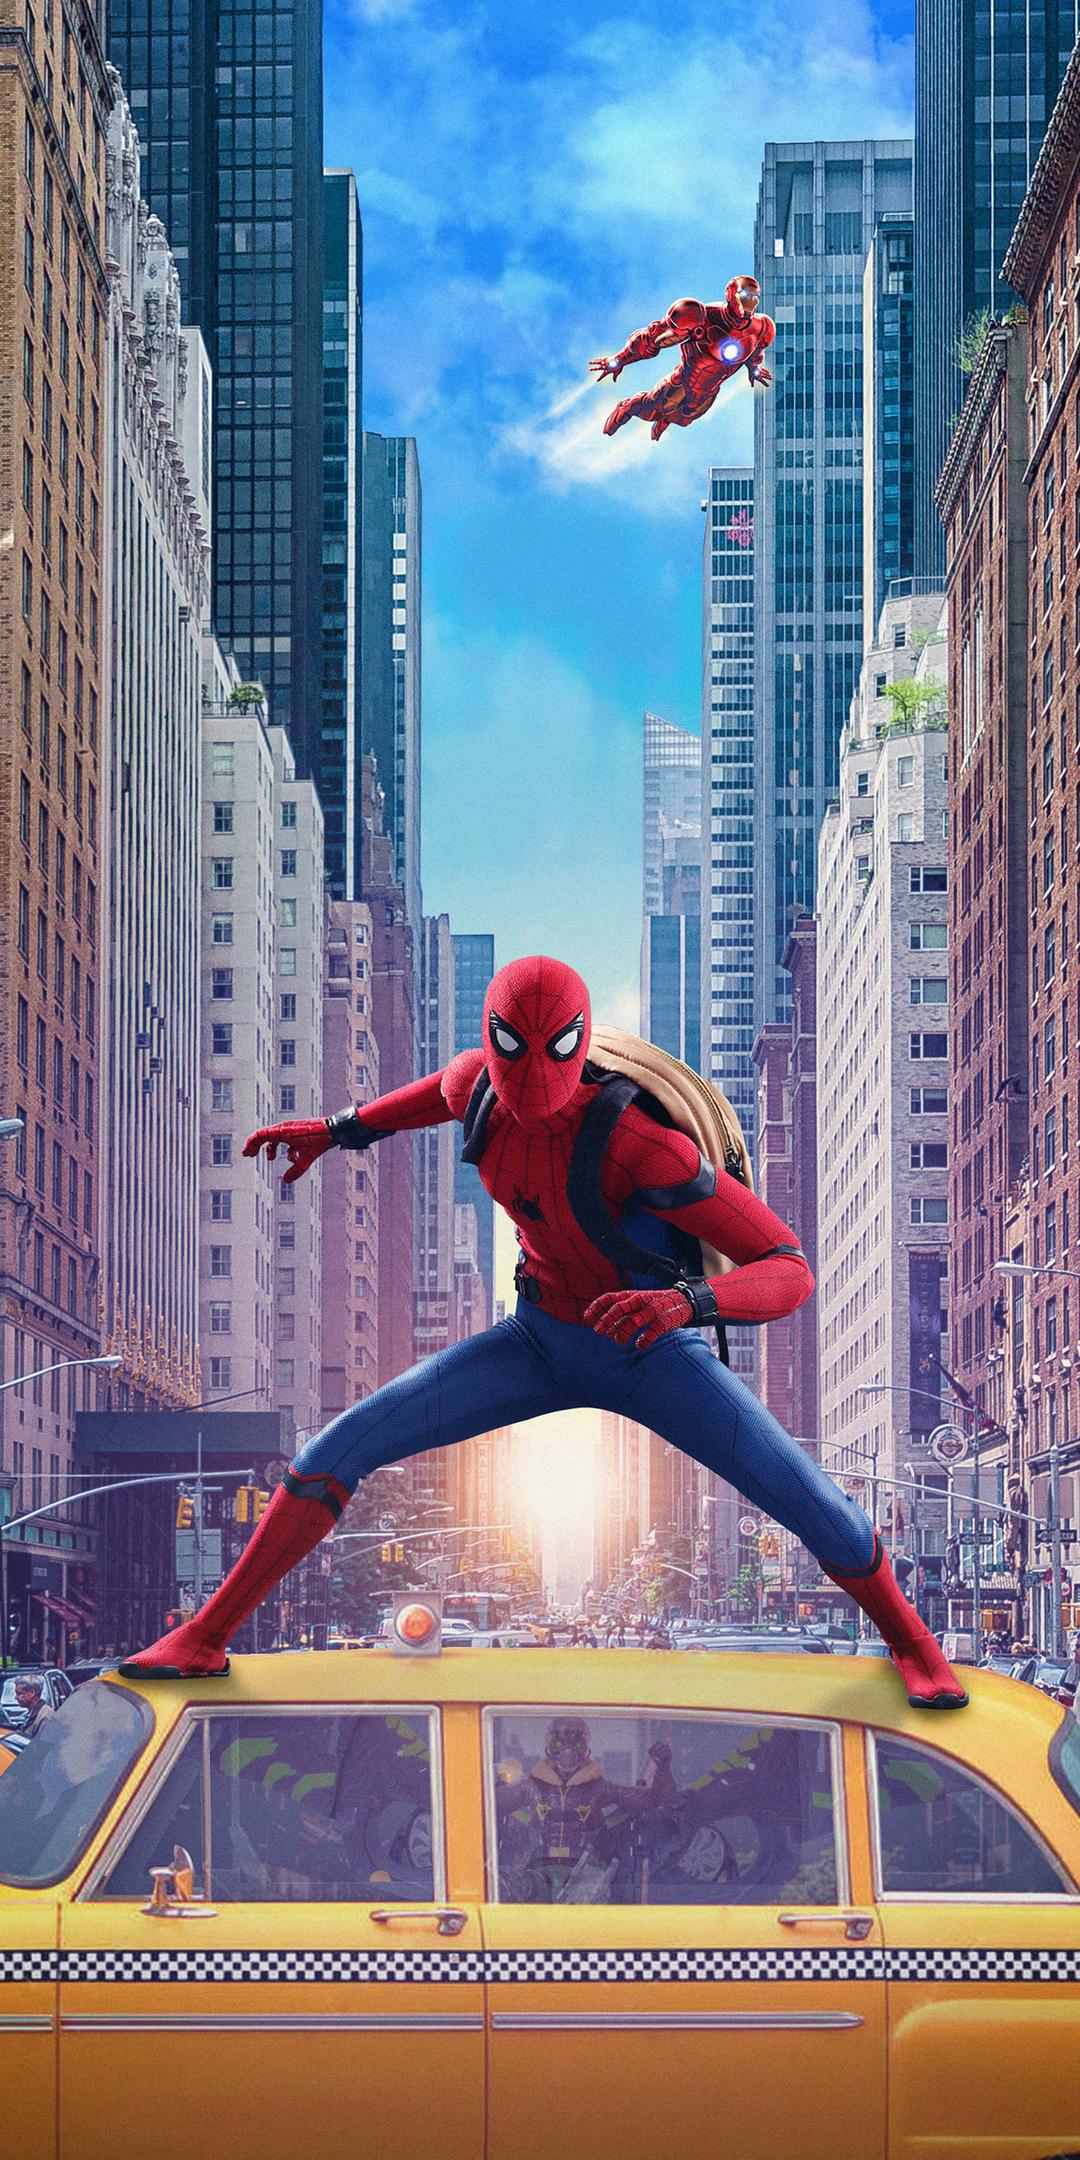 spiderman-homecoming-movie-poster-c1.jpg